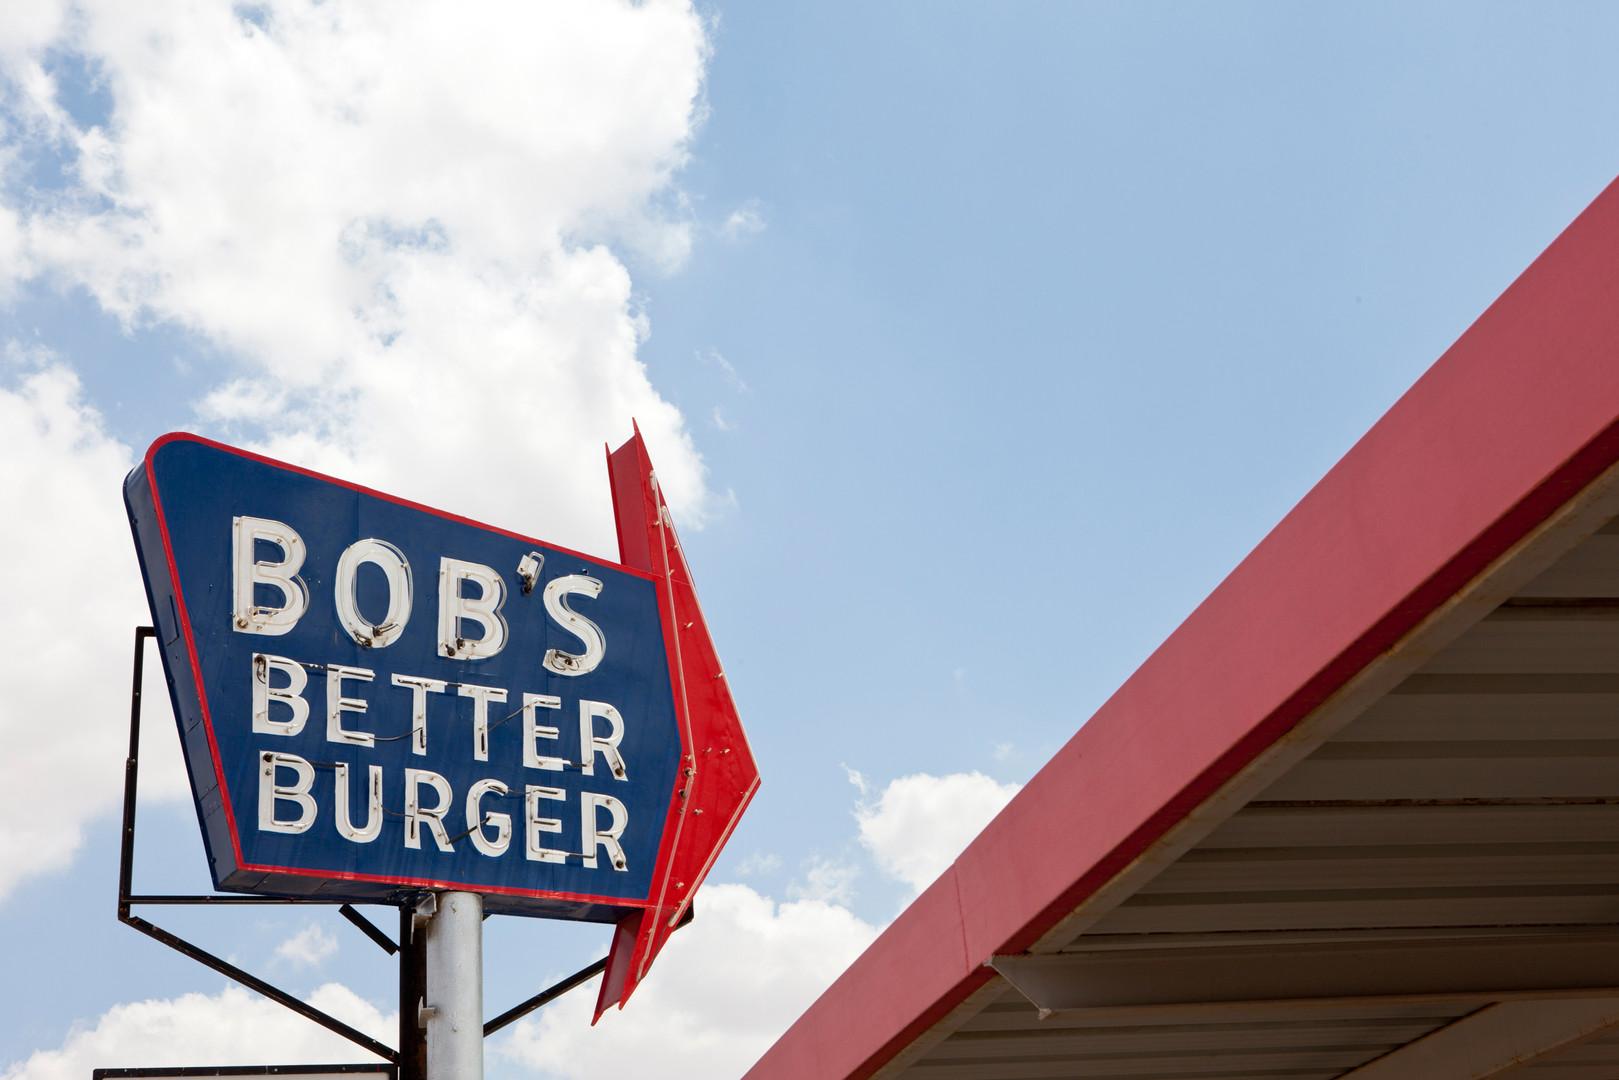 bobsbetterburger01.jpg